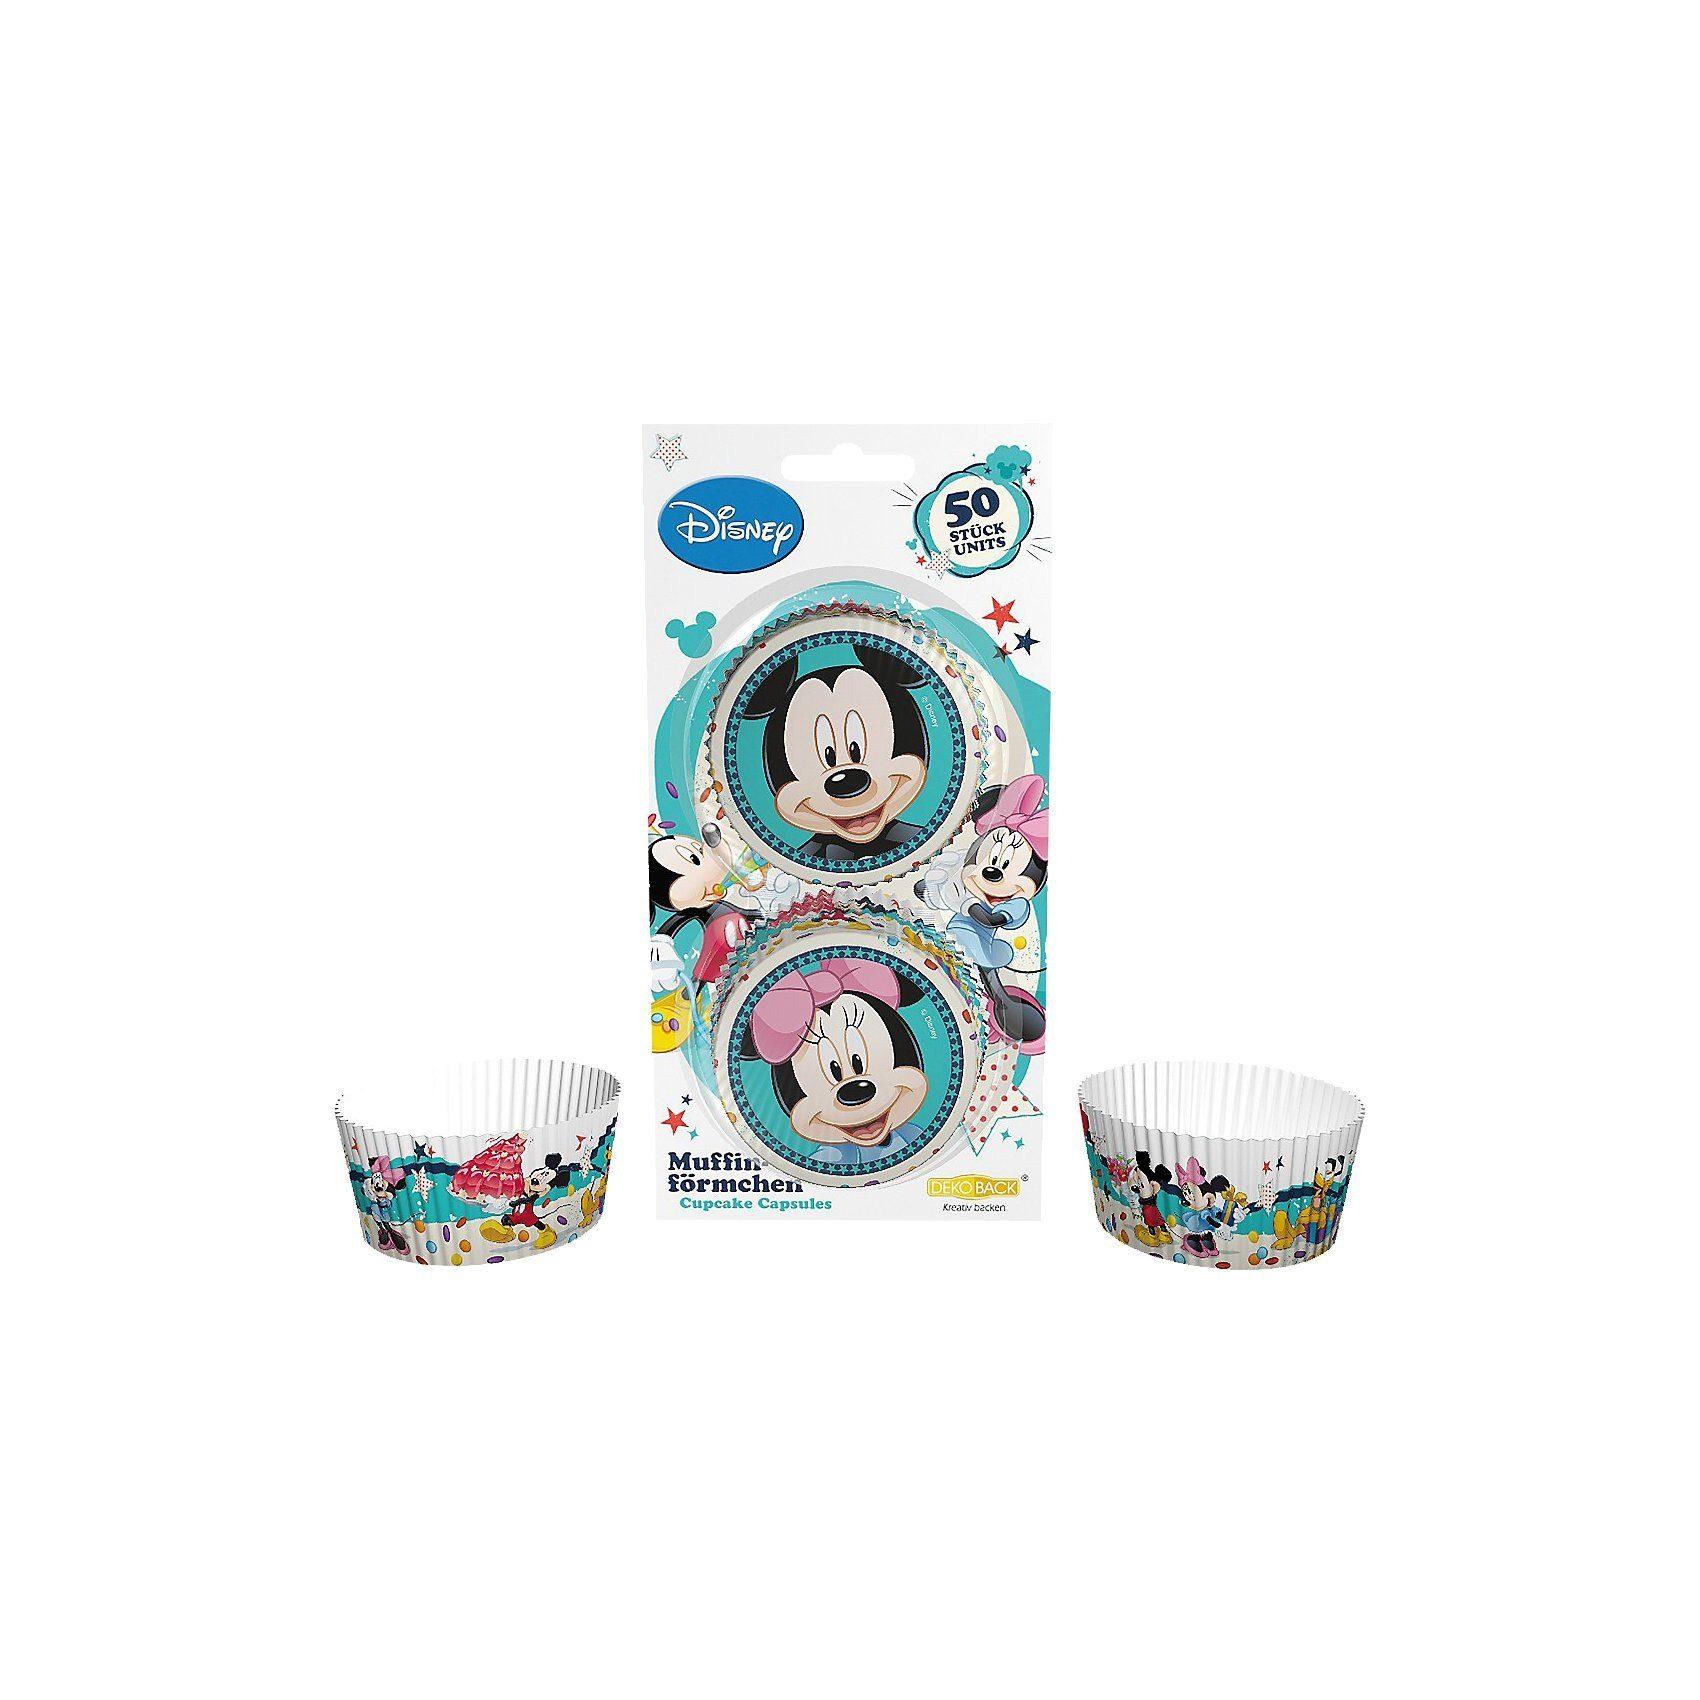 Dekoback Papier-Backförmchen Mickey & Minnie Mouse, 50 Stück